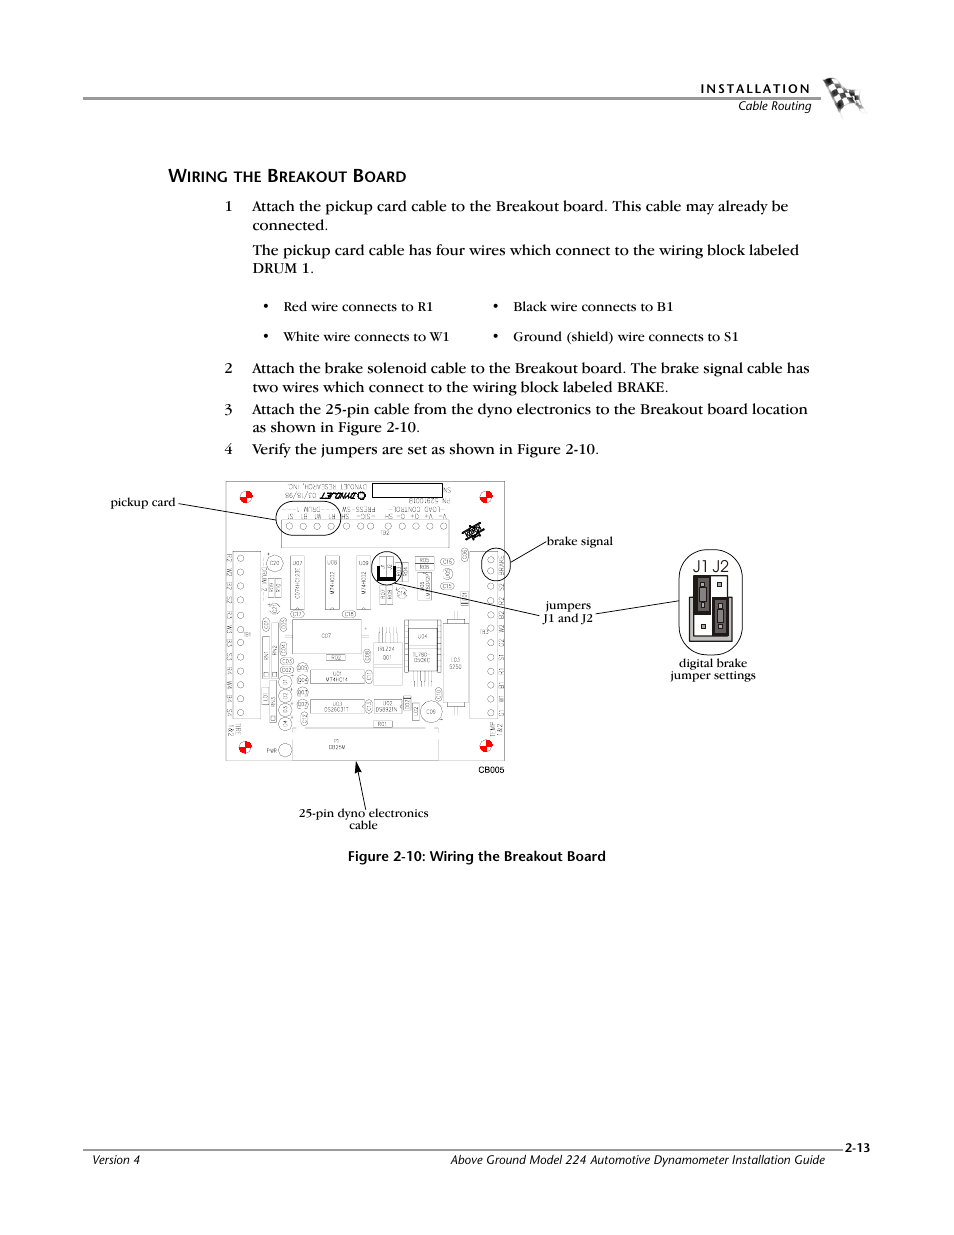 Wiring the breakout board | Dynojet 224x: Installation Guide User ...